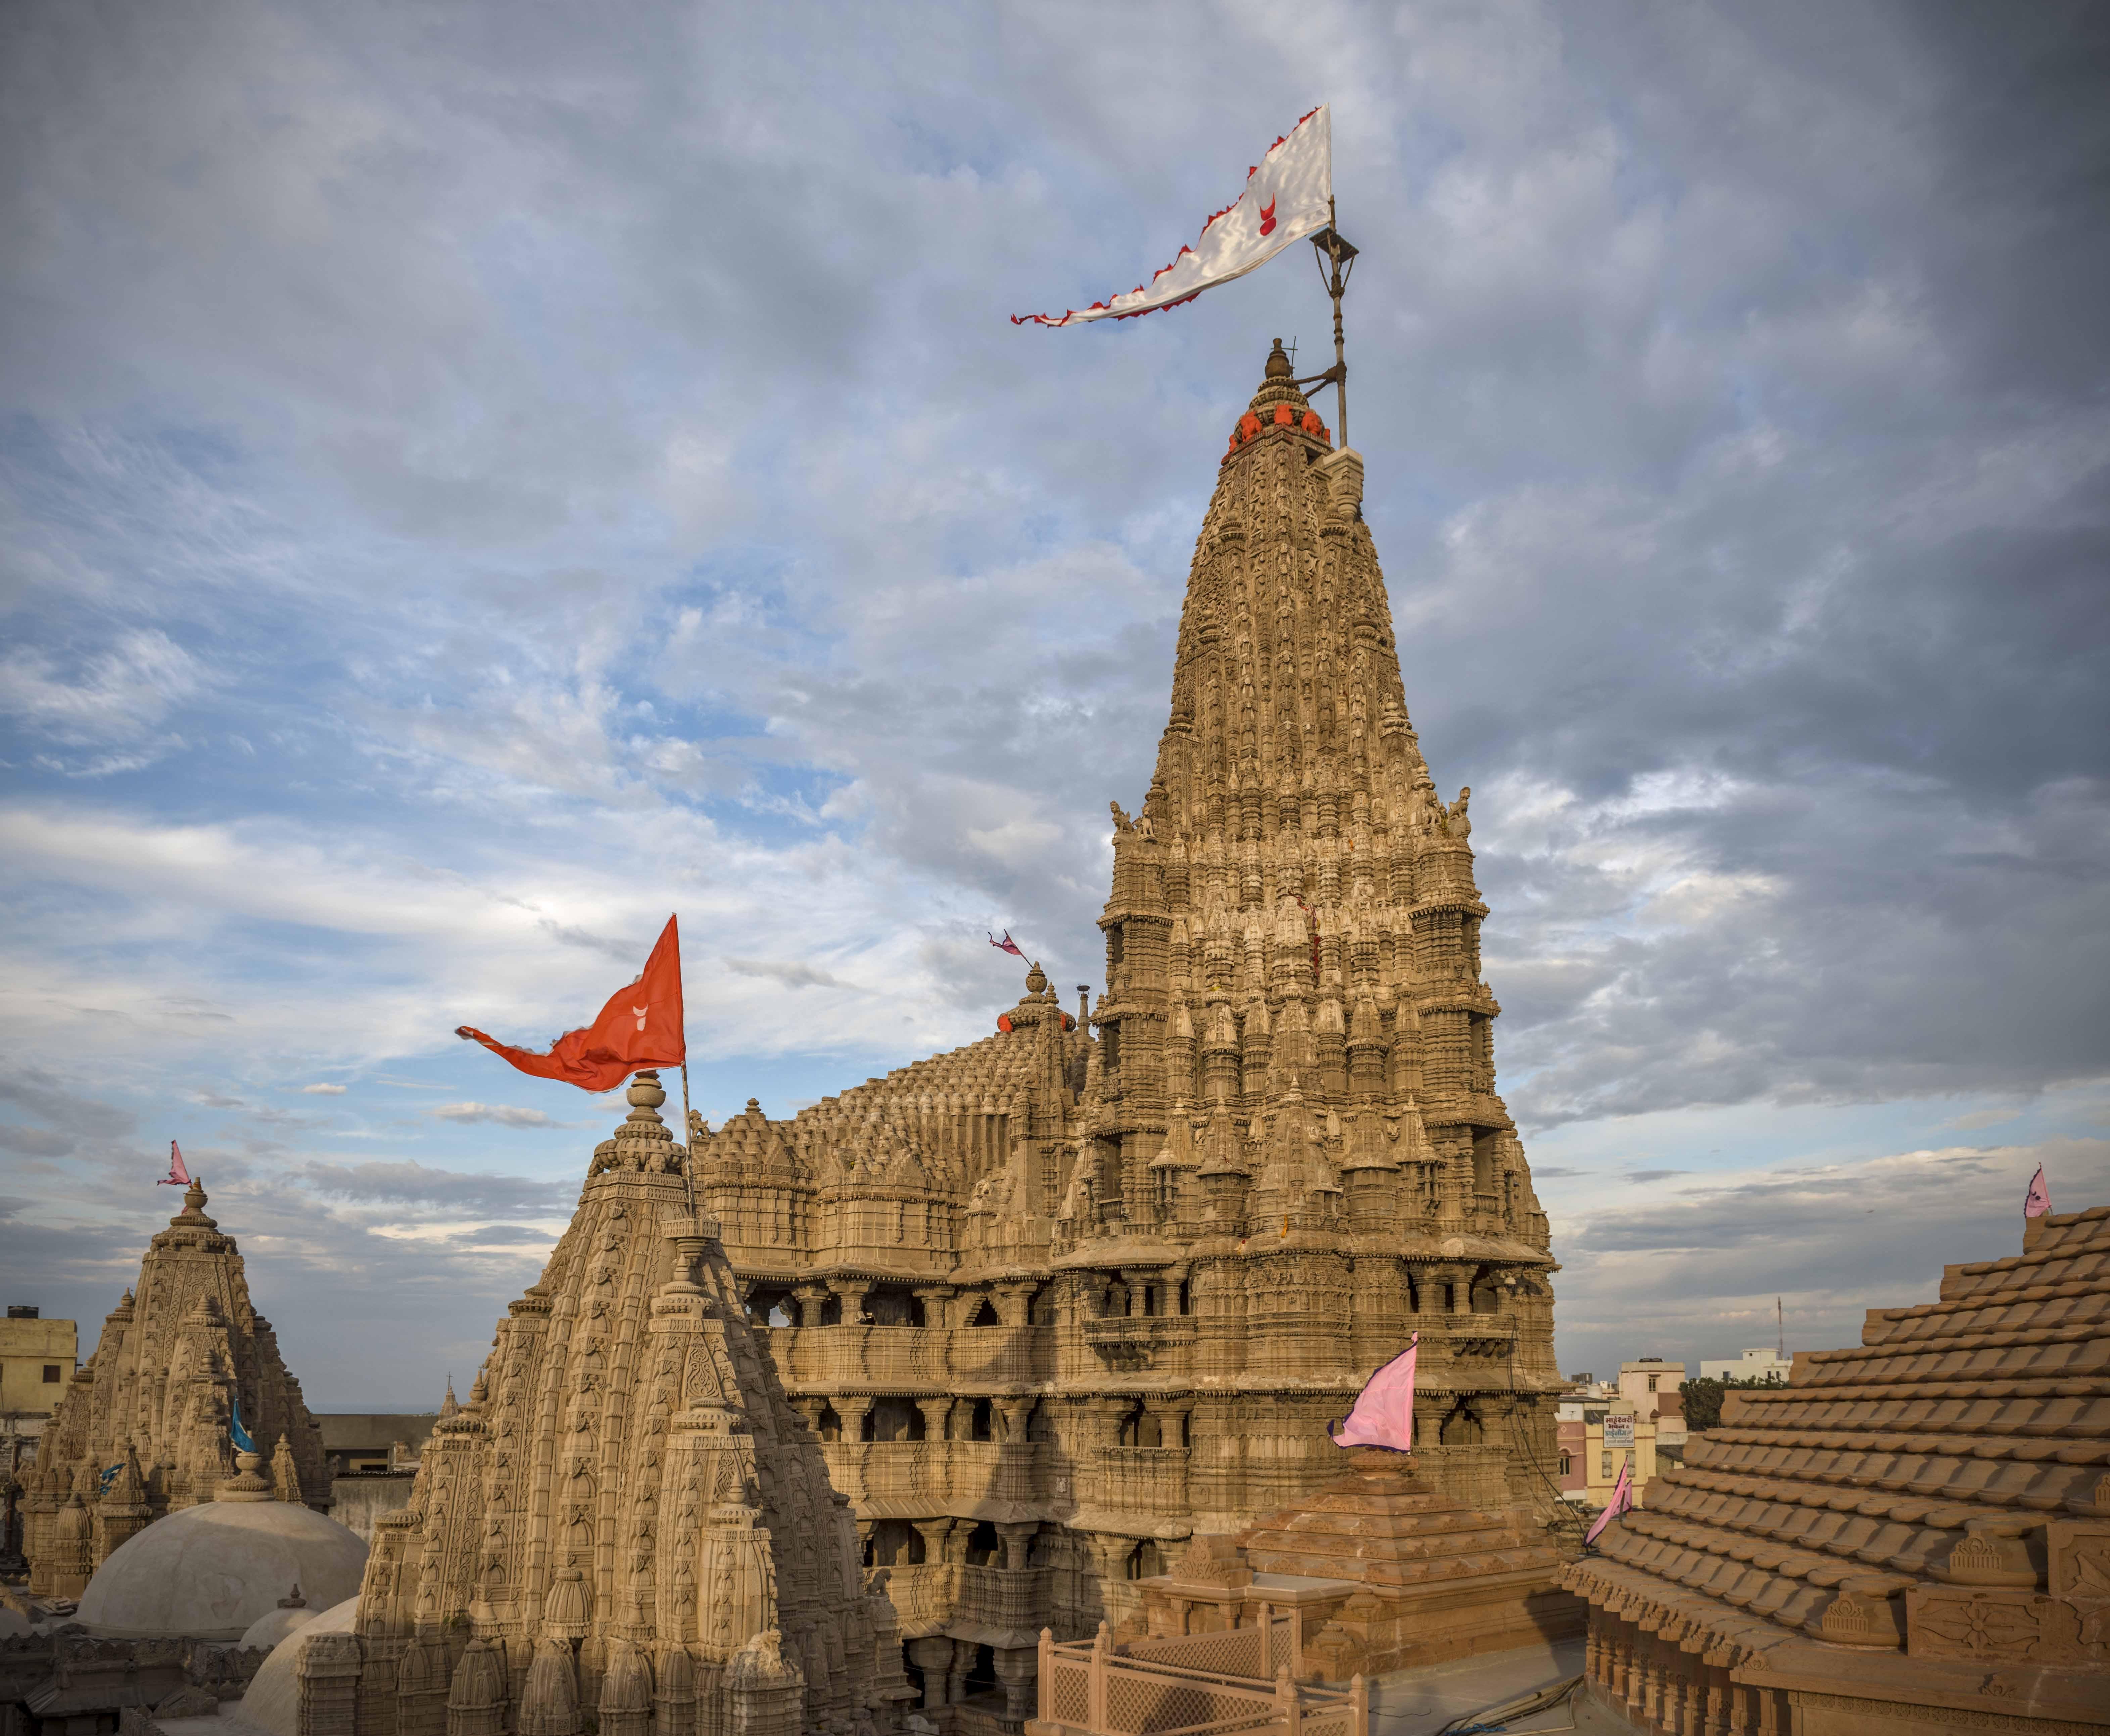 Dwarkadheesh temple, Dwarka, India